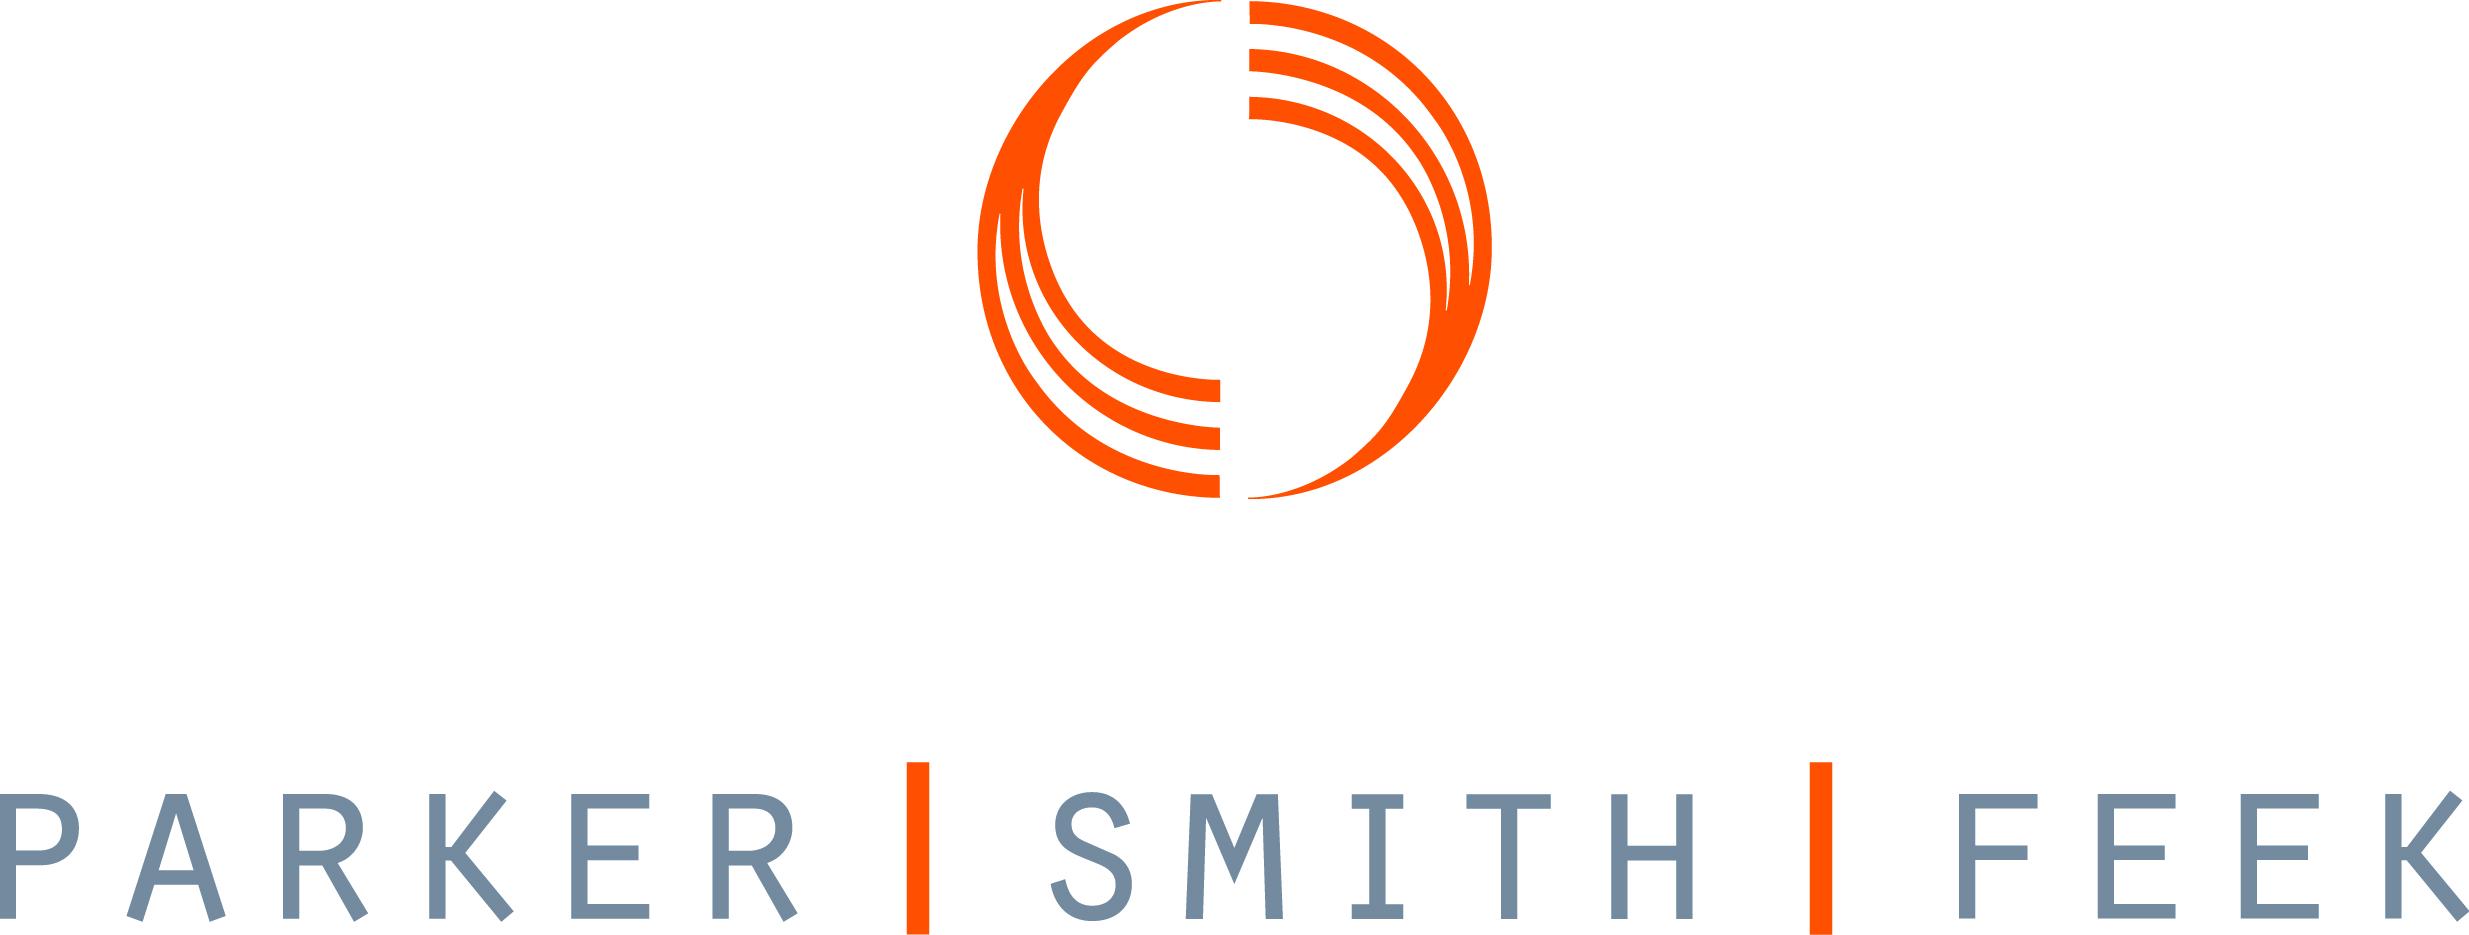 Parker_Smith_Feek_logo.jpg